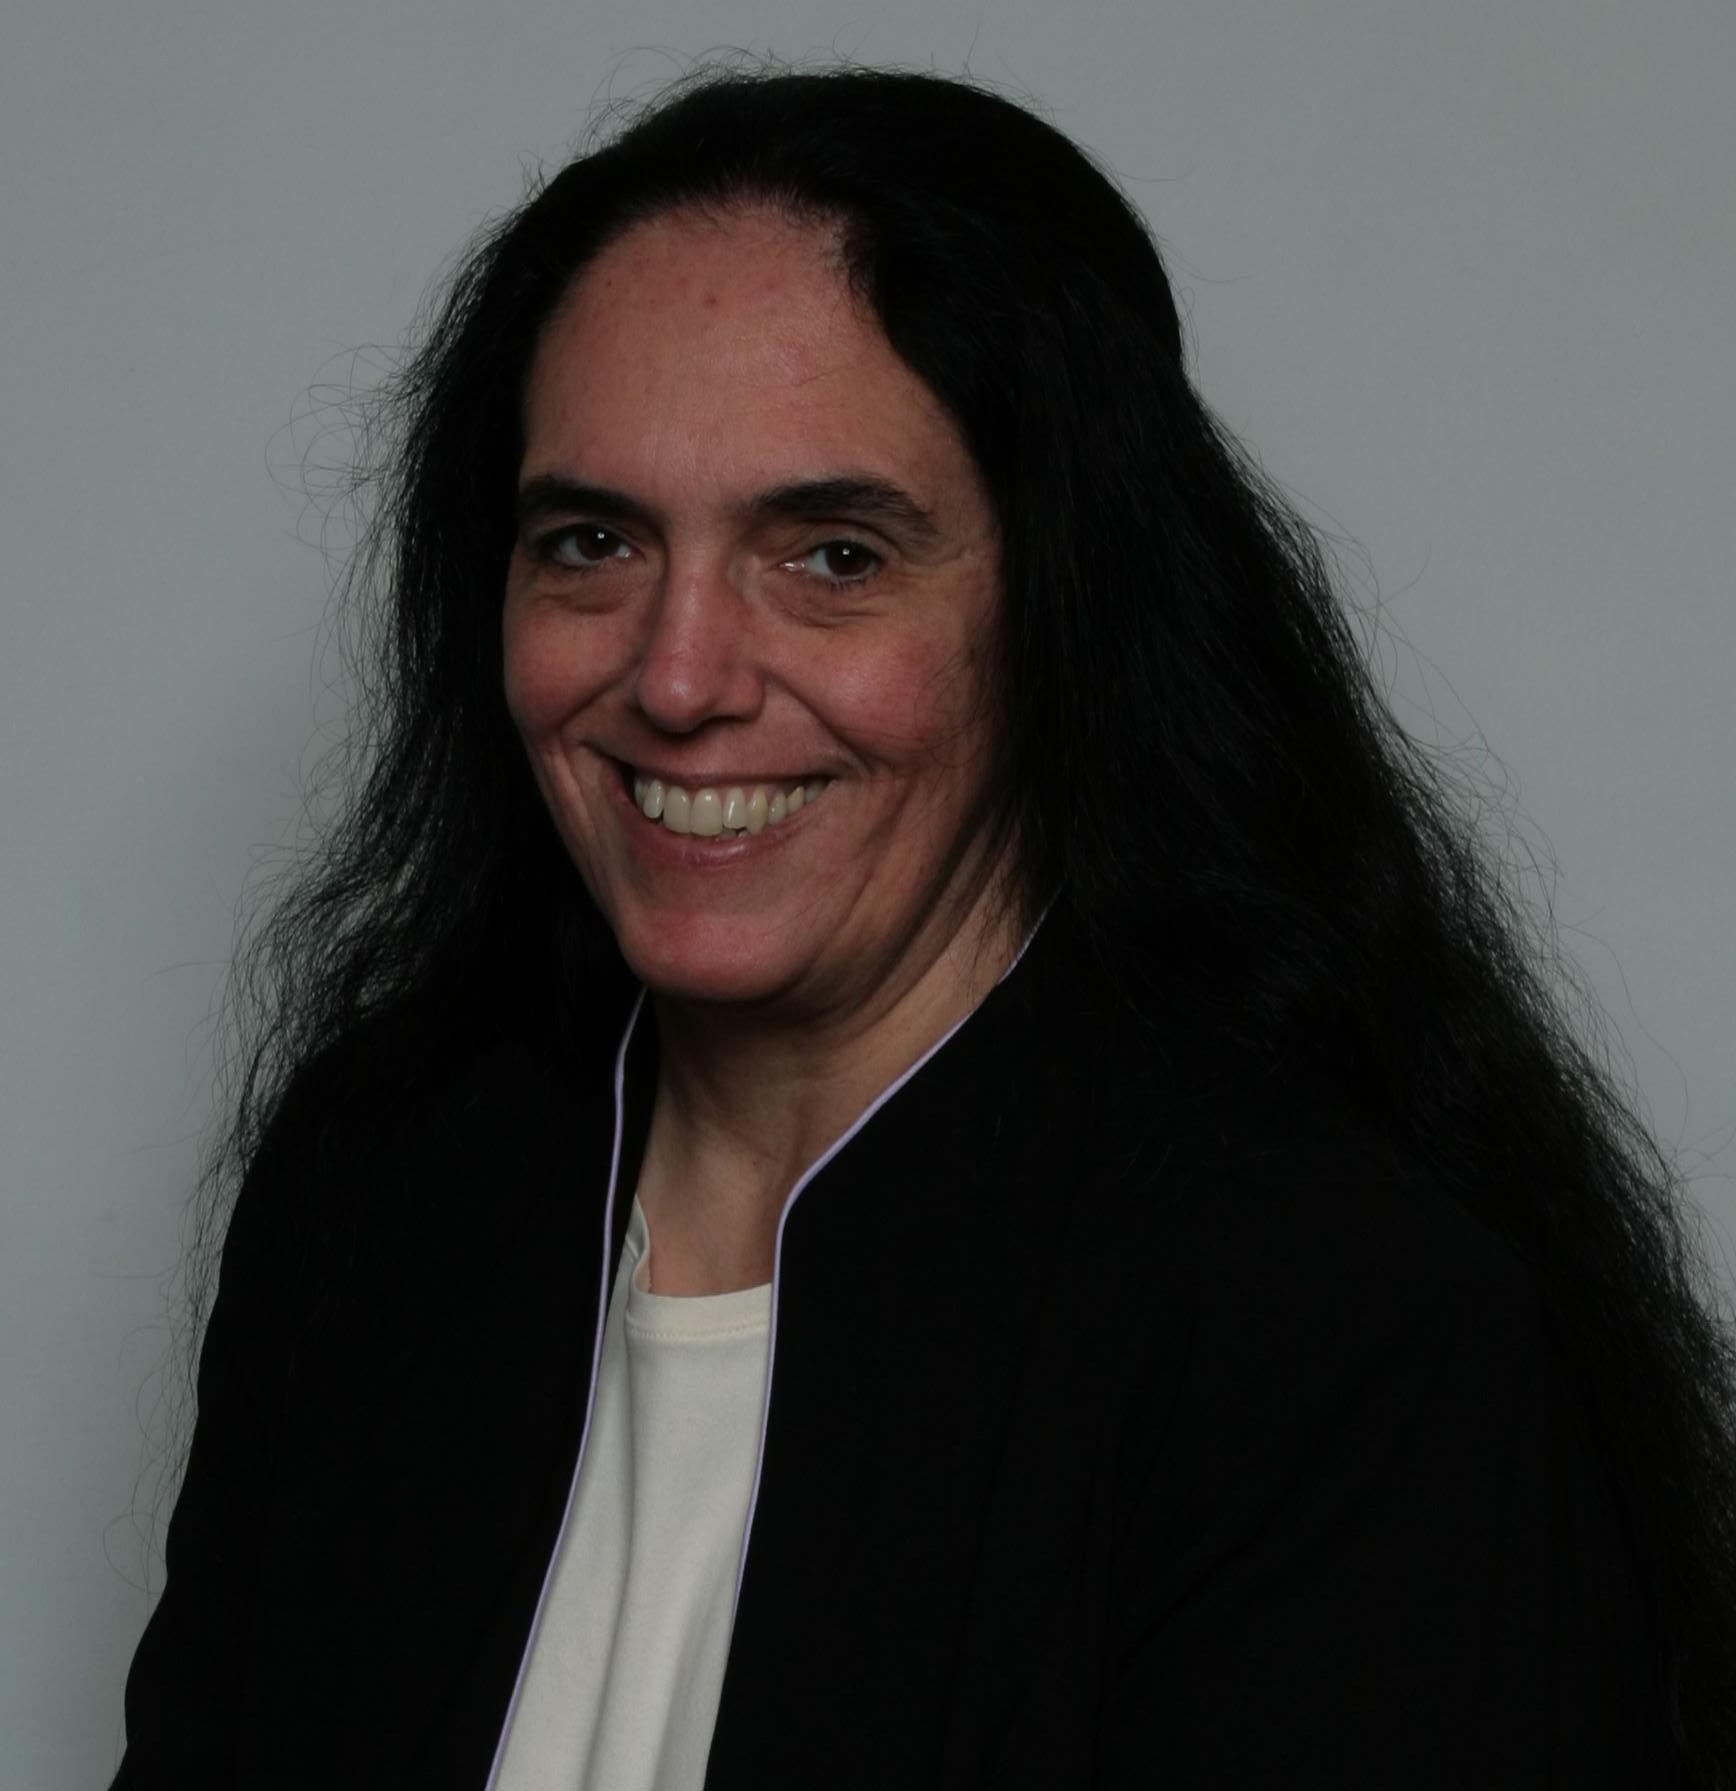 Cheryl Landes